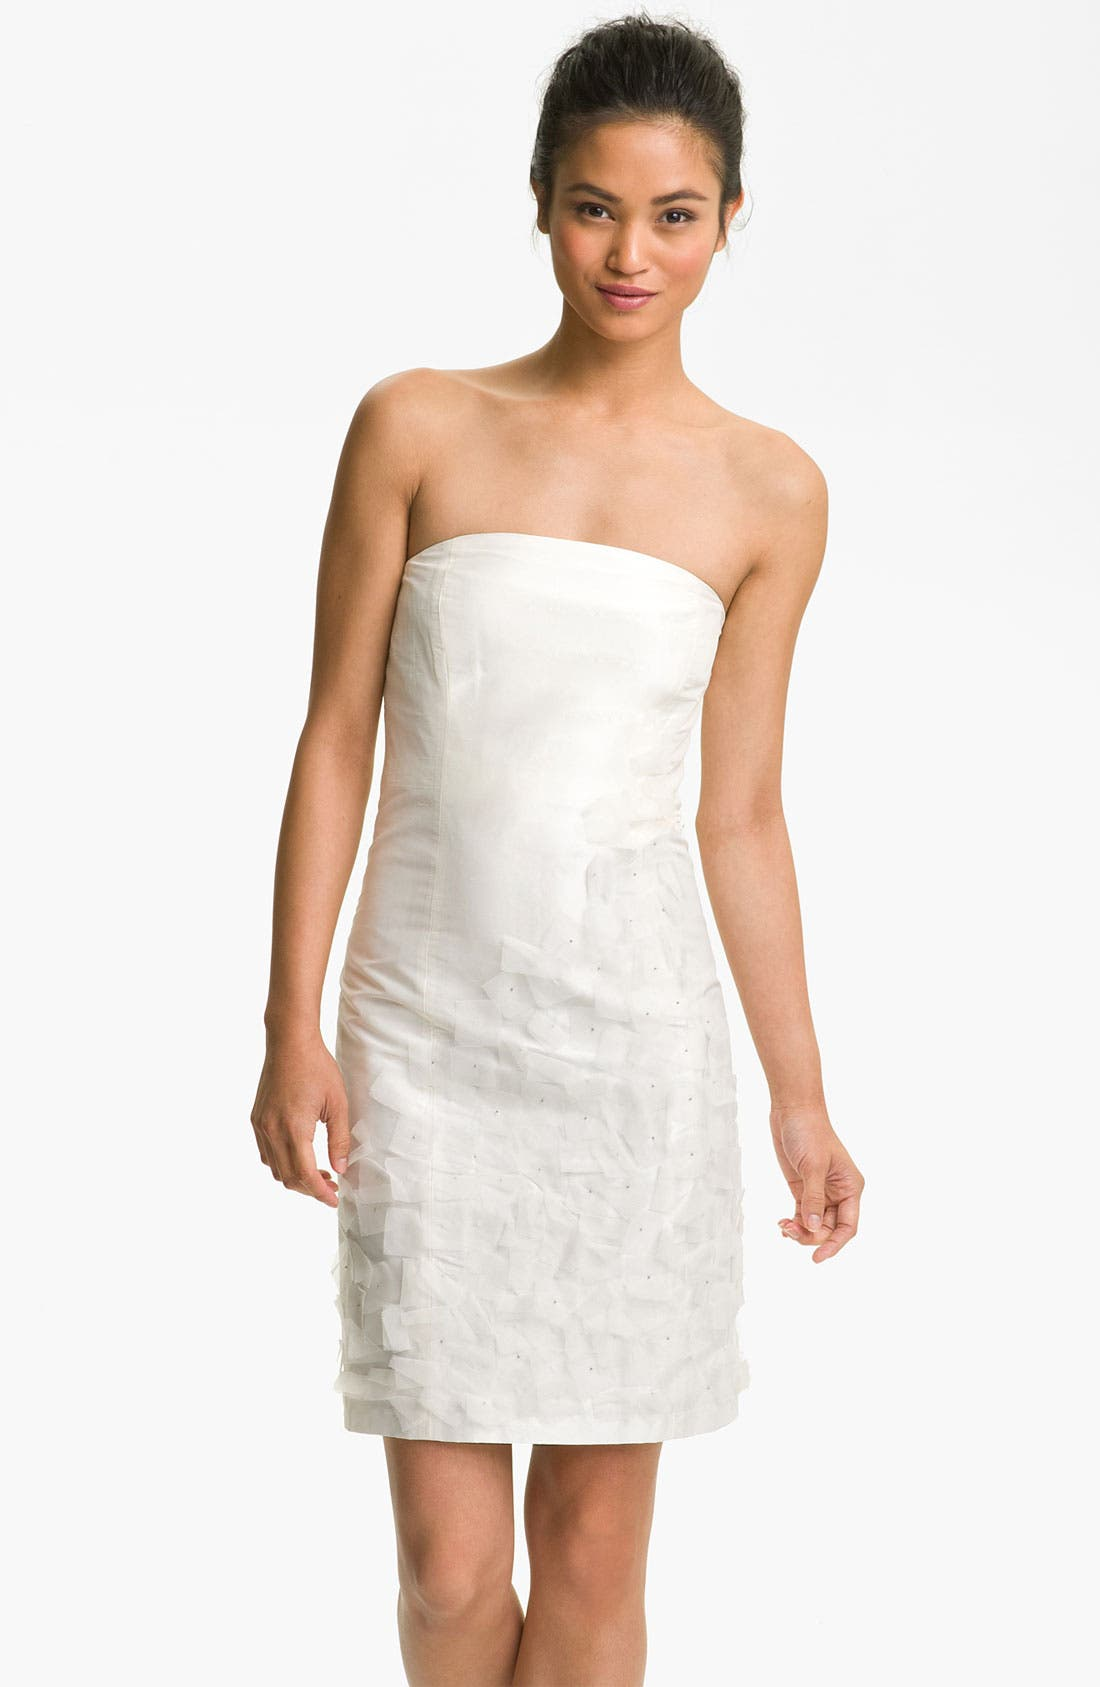 Alternate Image 1 Selected - Suzi Chin for Maggy Boutique Organza Appliqué Strapless Dupioni Dress